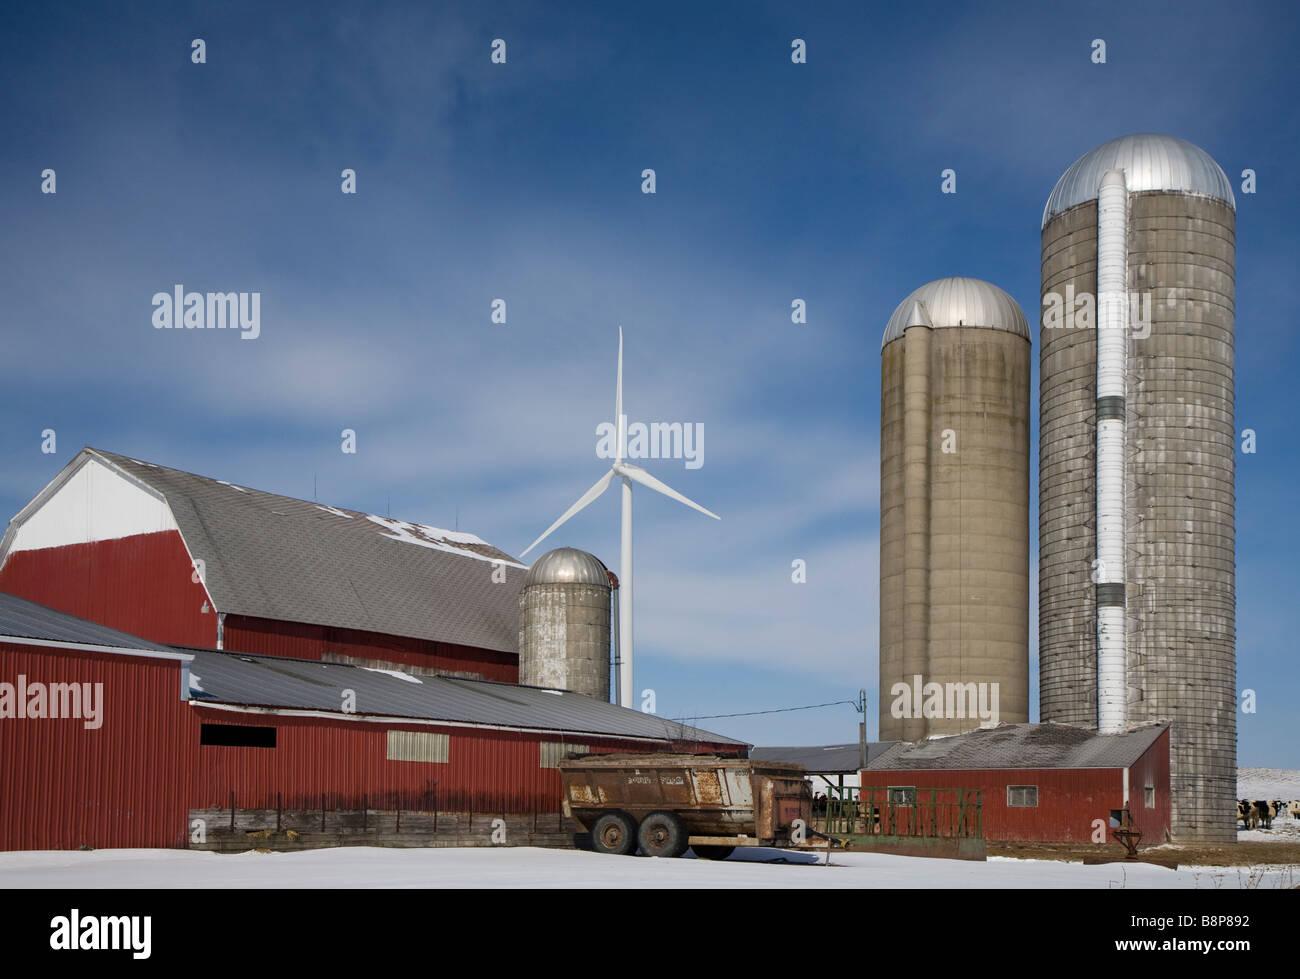 Wind Turbines in Rural Michigan - Stock Image